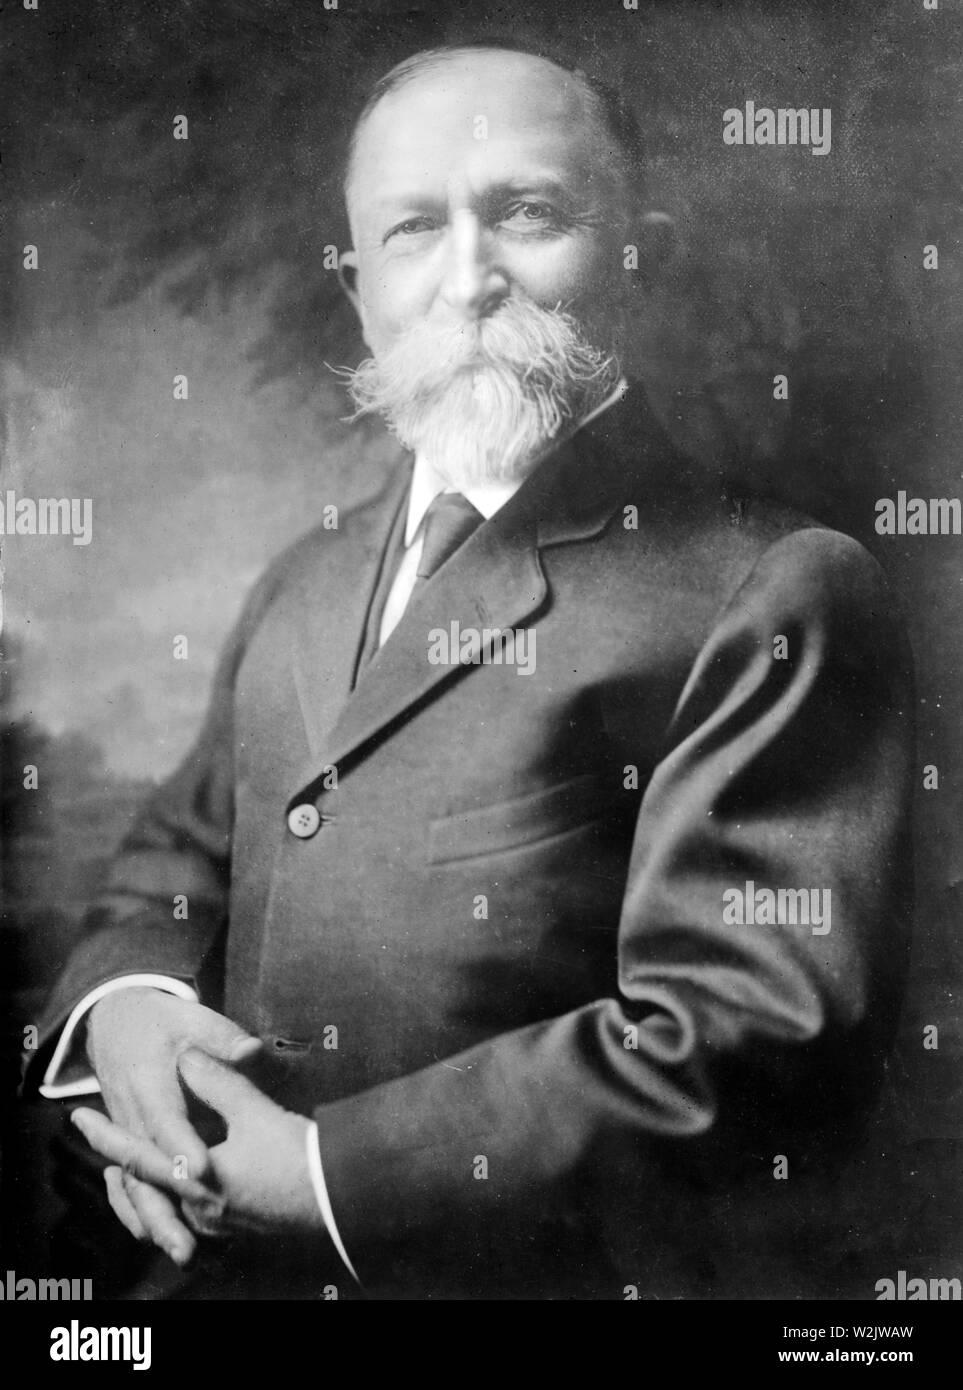 John Harvey Kellogg, co-founder of the Kellogg Company, John Harvey Kellogg (1852 – 1943) American businessman - Stock Image